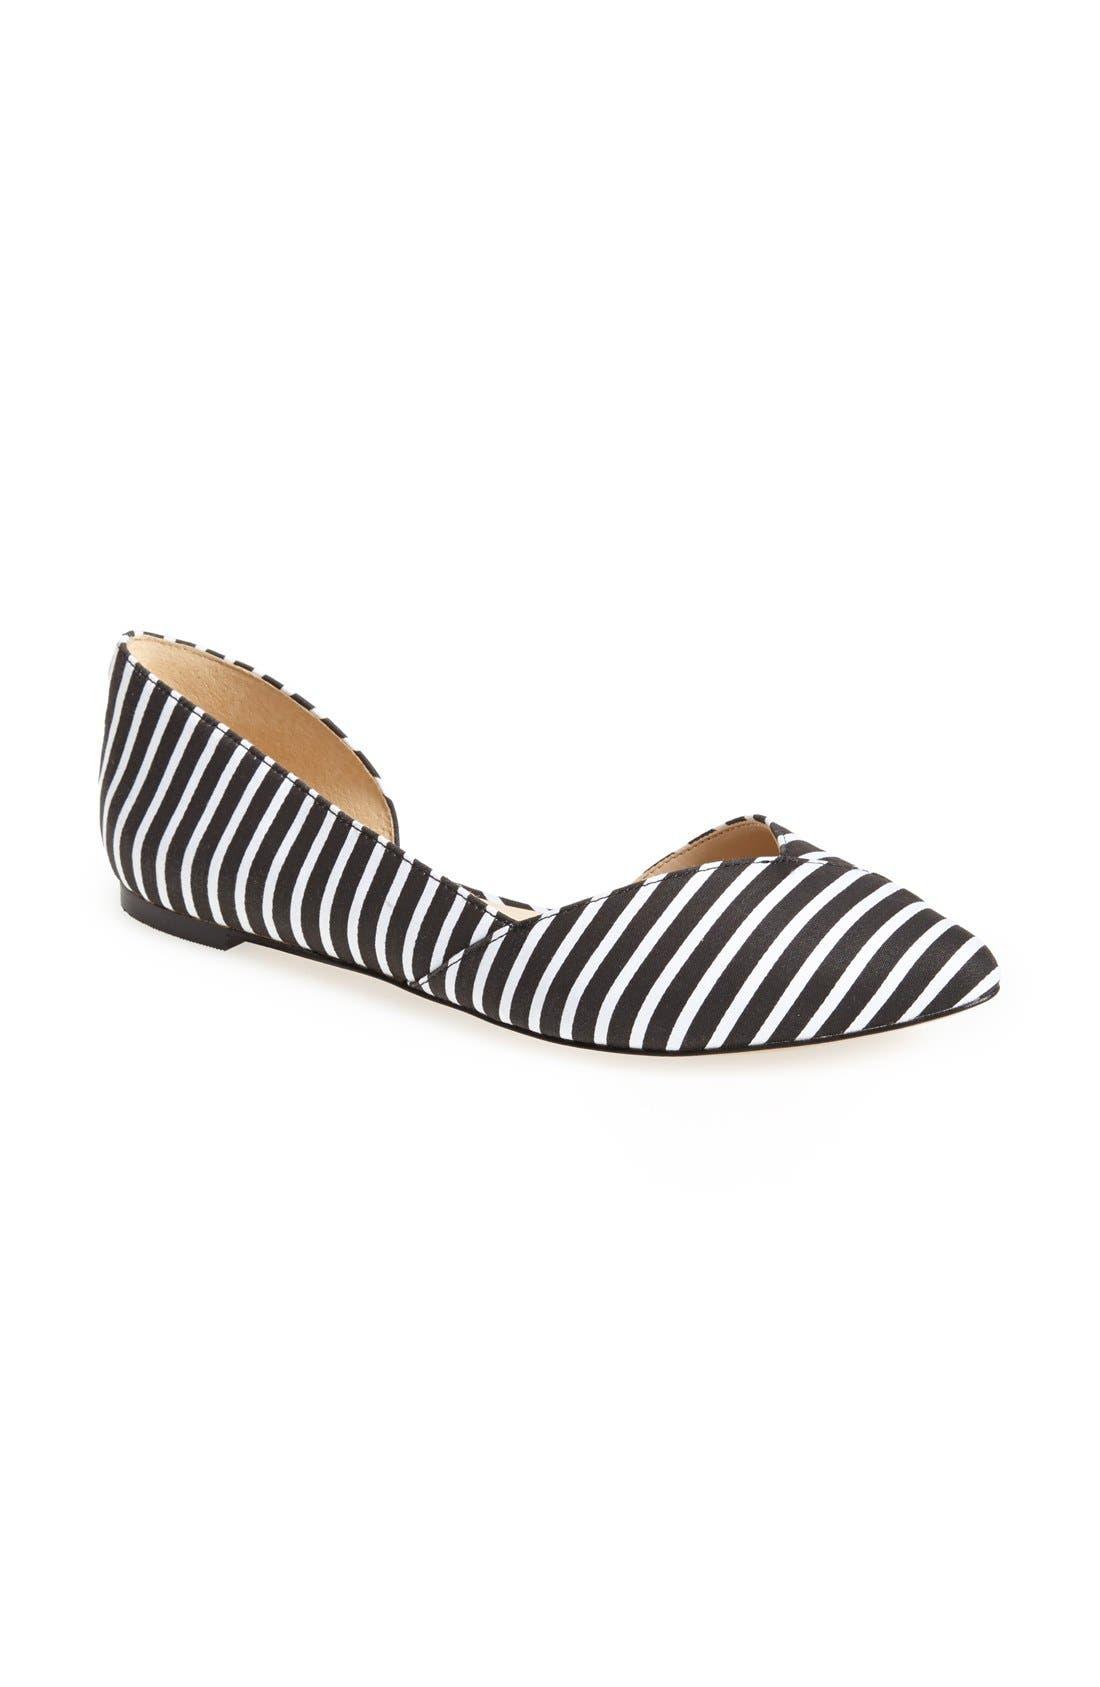 Main Image - Sole Society 'Danielle' Pointy Toe Flat (Women)